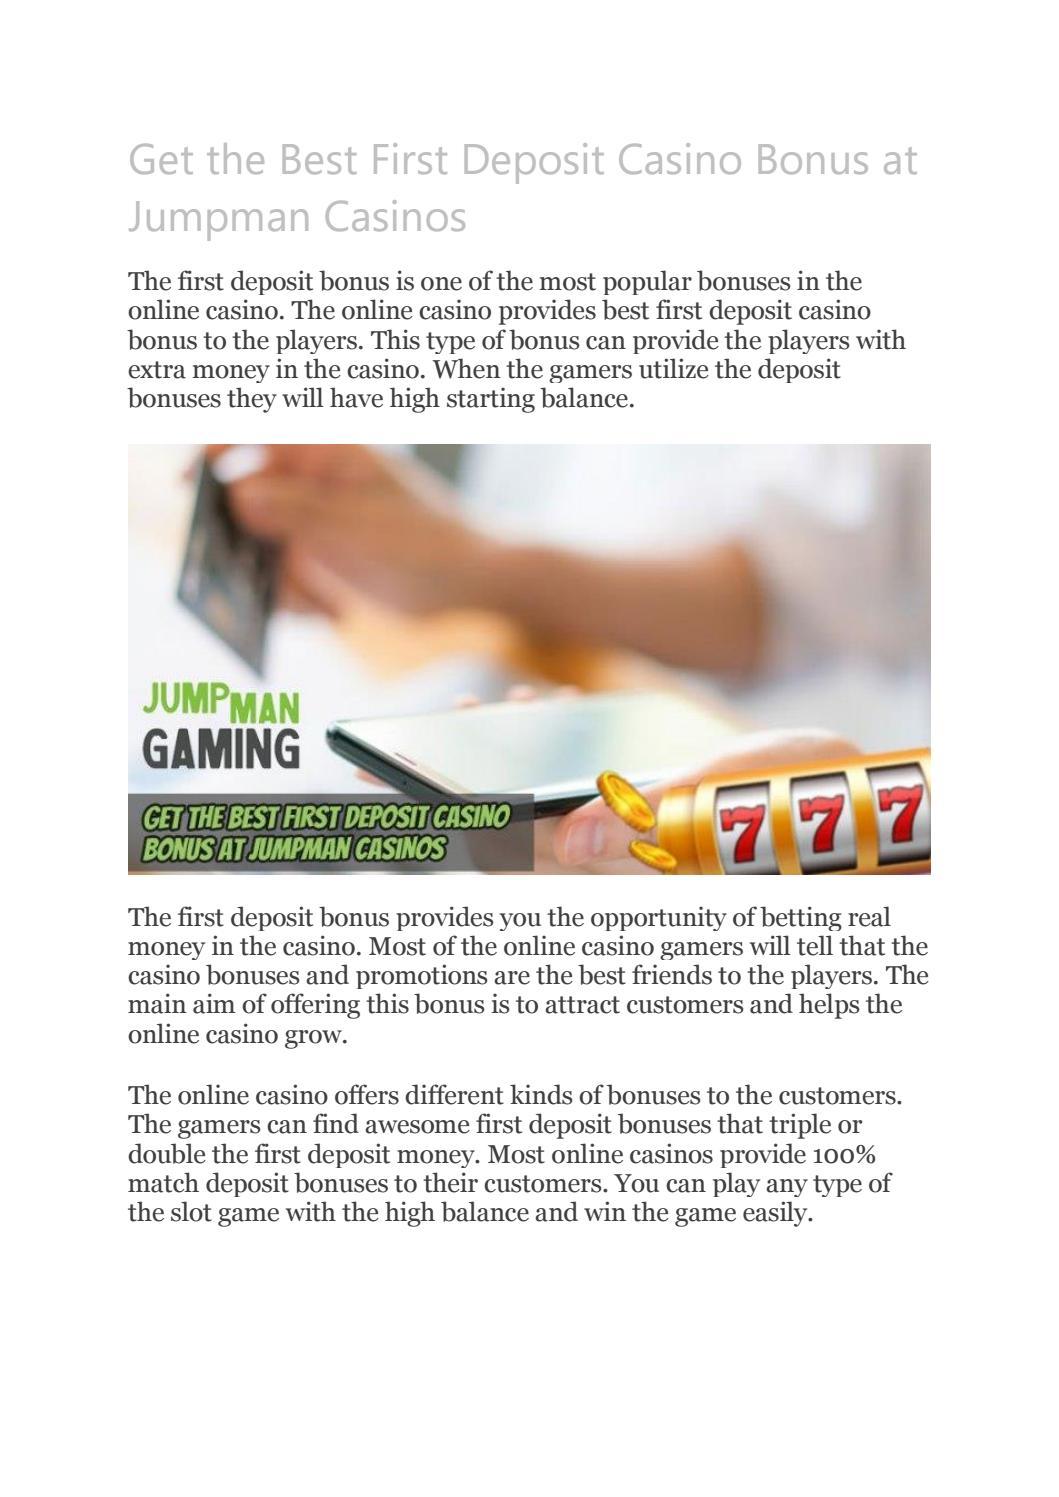 Get The Best First Deposit Casino Bonus At Jumpman Casinos By Playleon Issuu